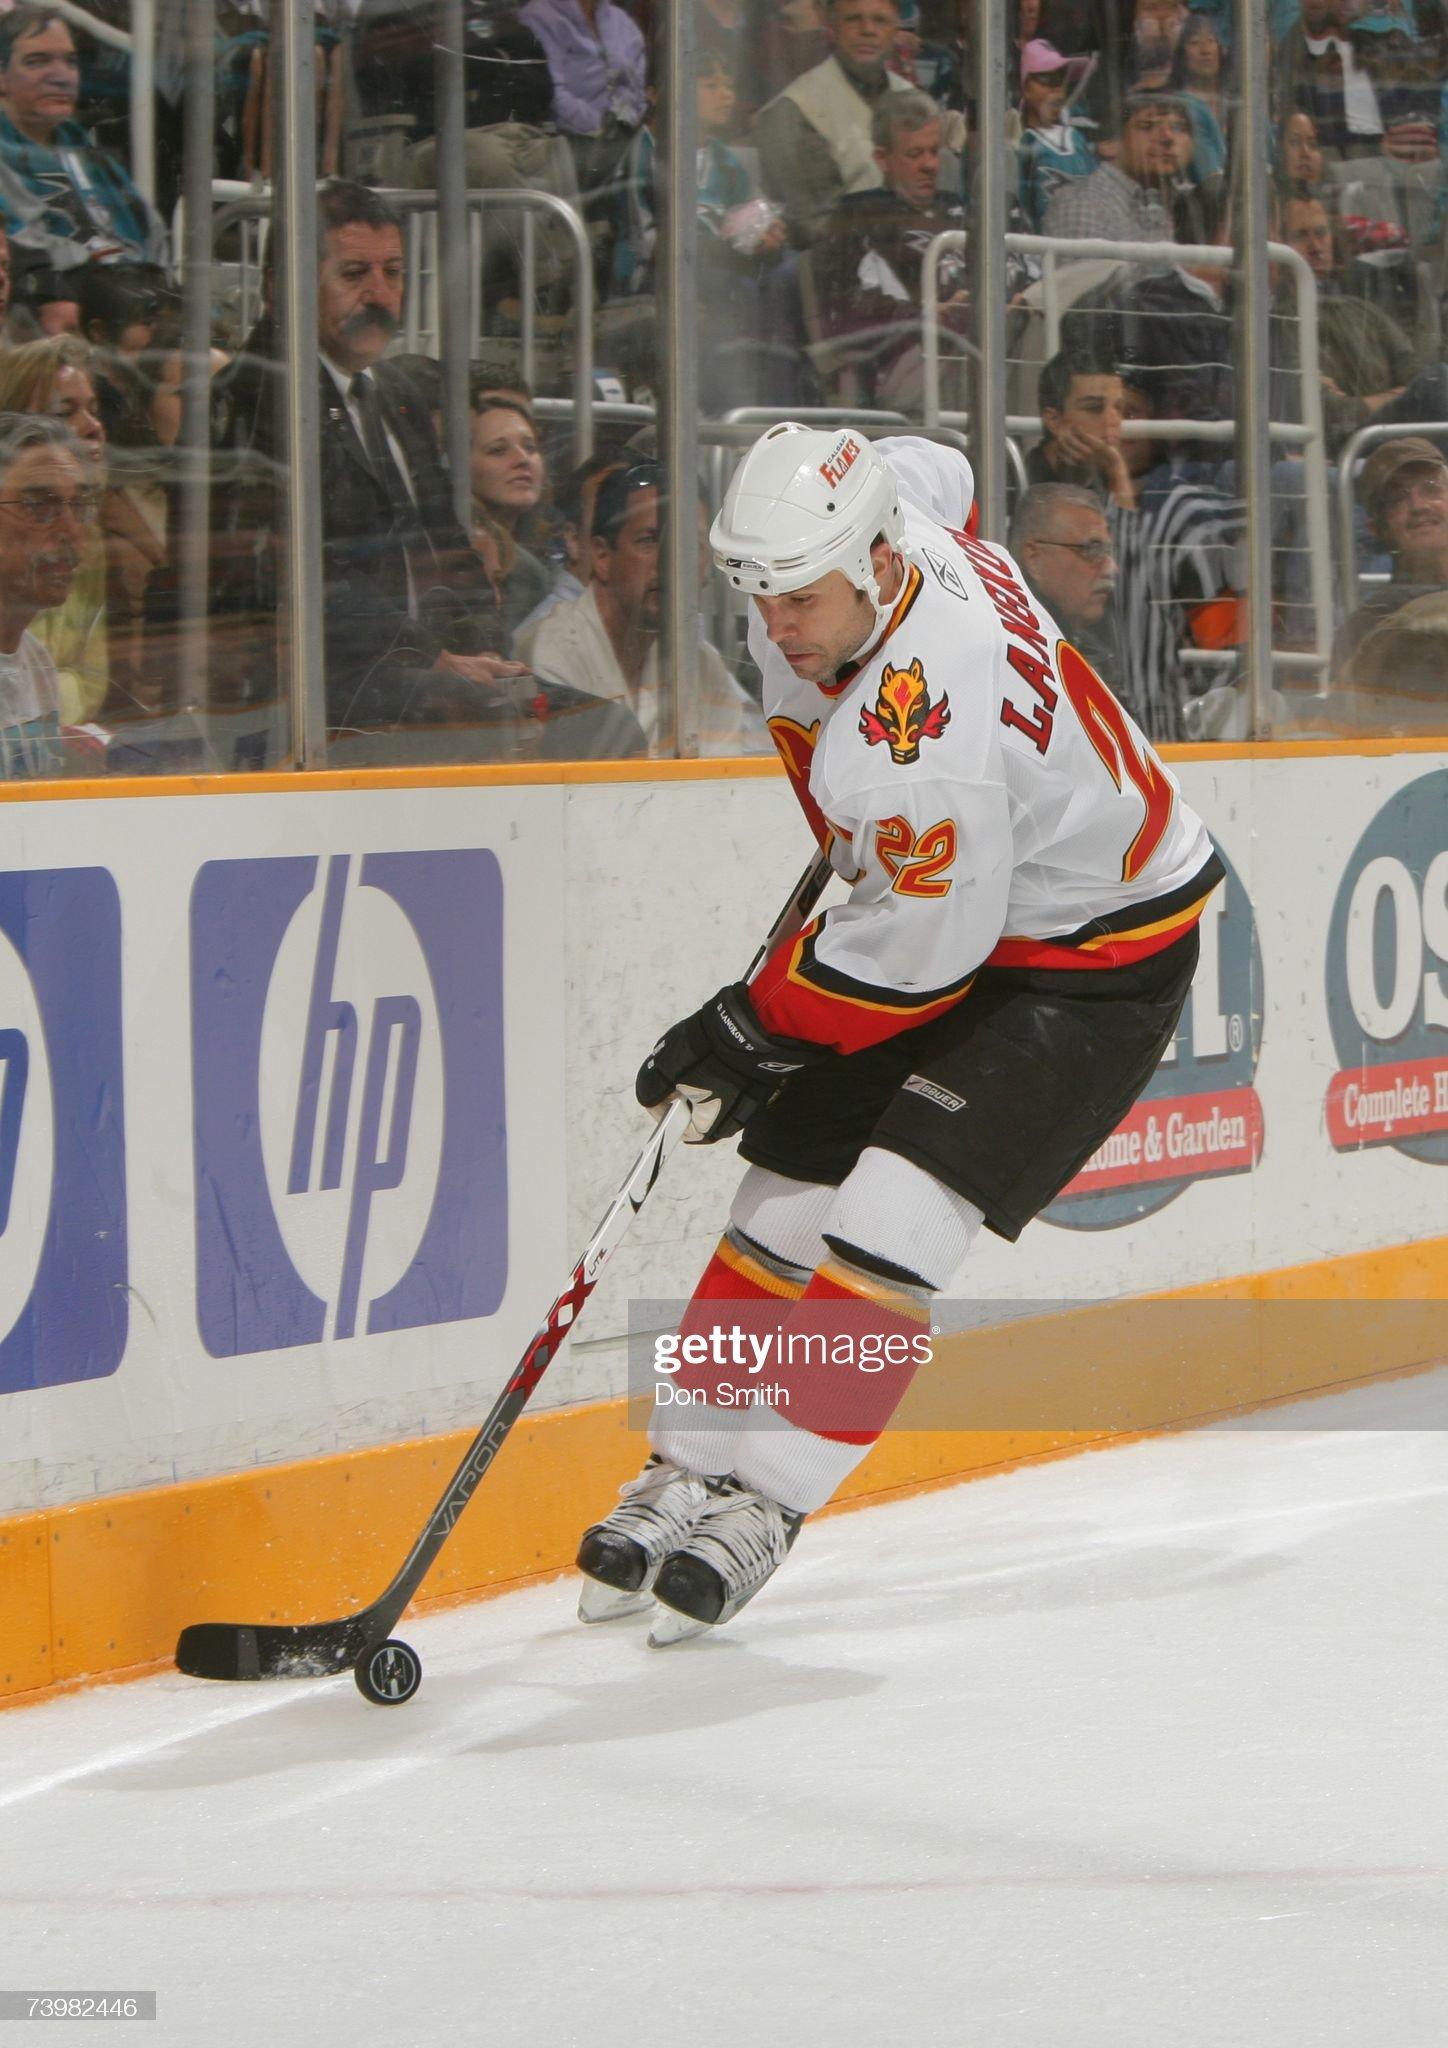 david-langkow-of-the-calgary-flames-skat